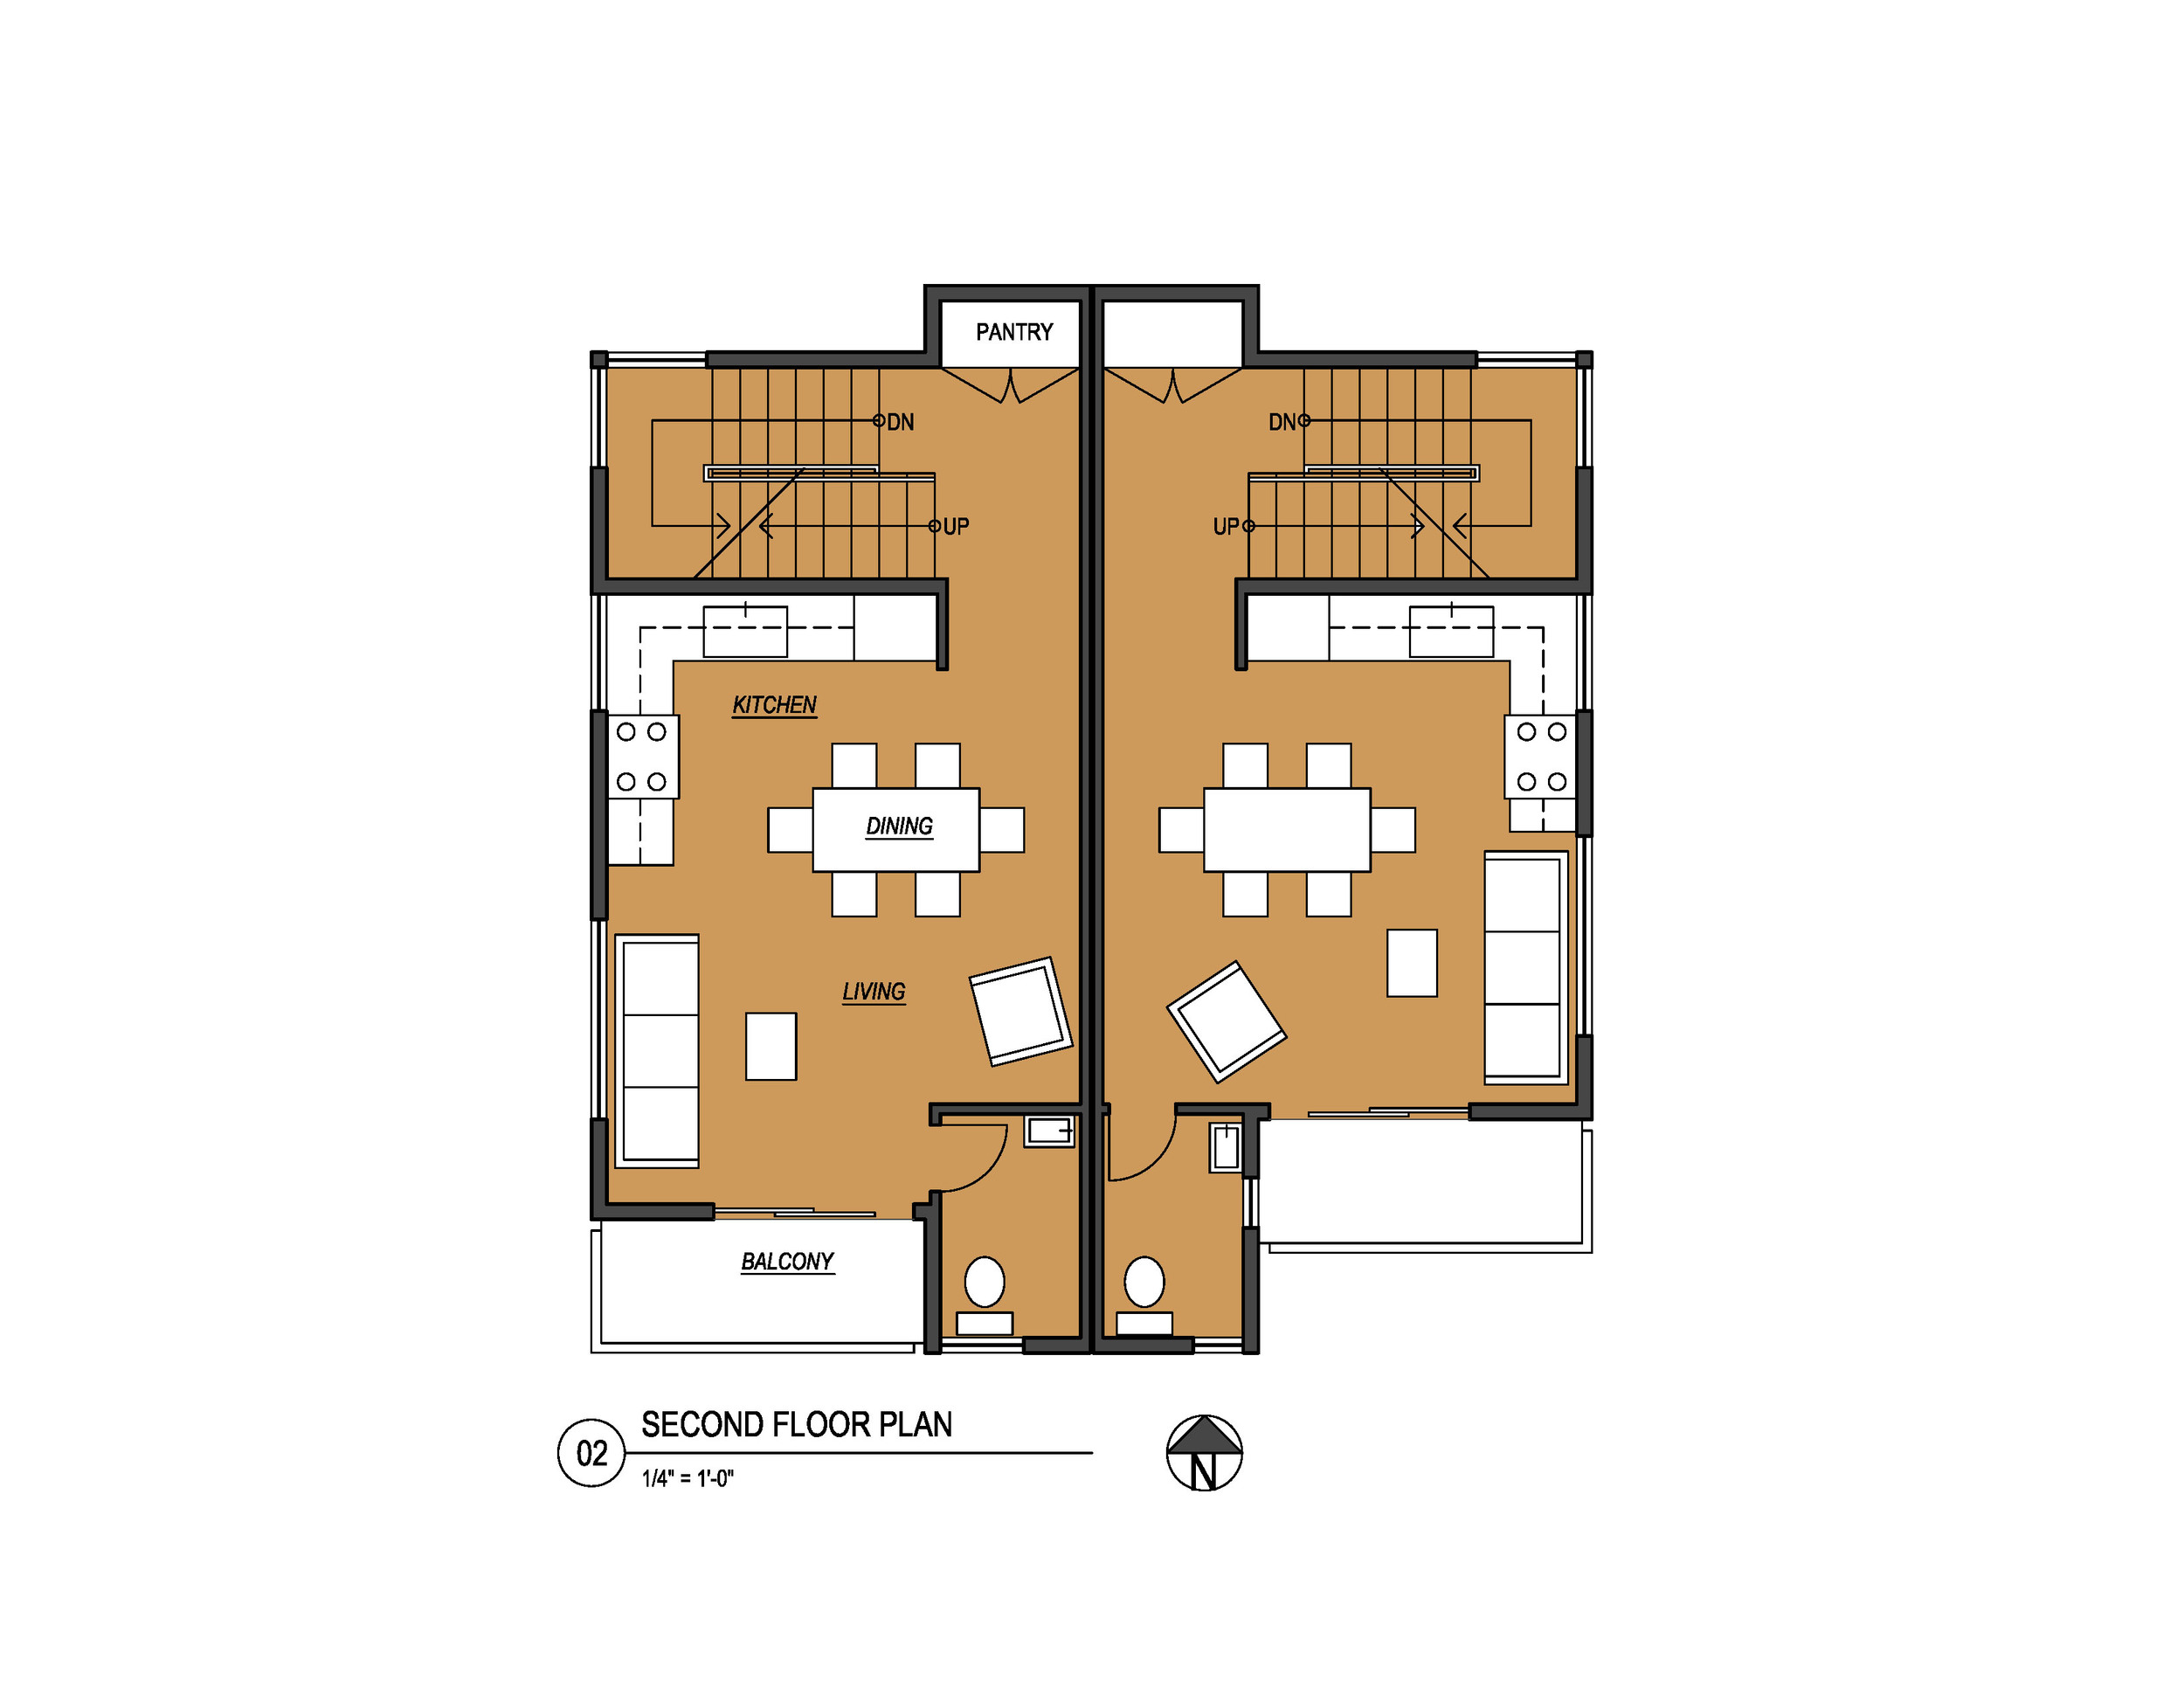 graphicNW60thTownhouses2ndFloorPlanCopyrightVELOCIPEDEarchitectsinc2016 1.jpg